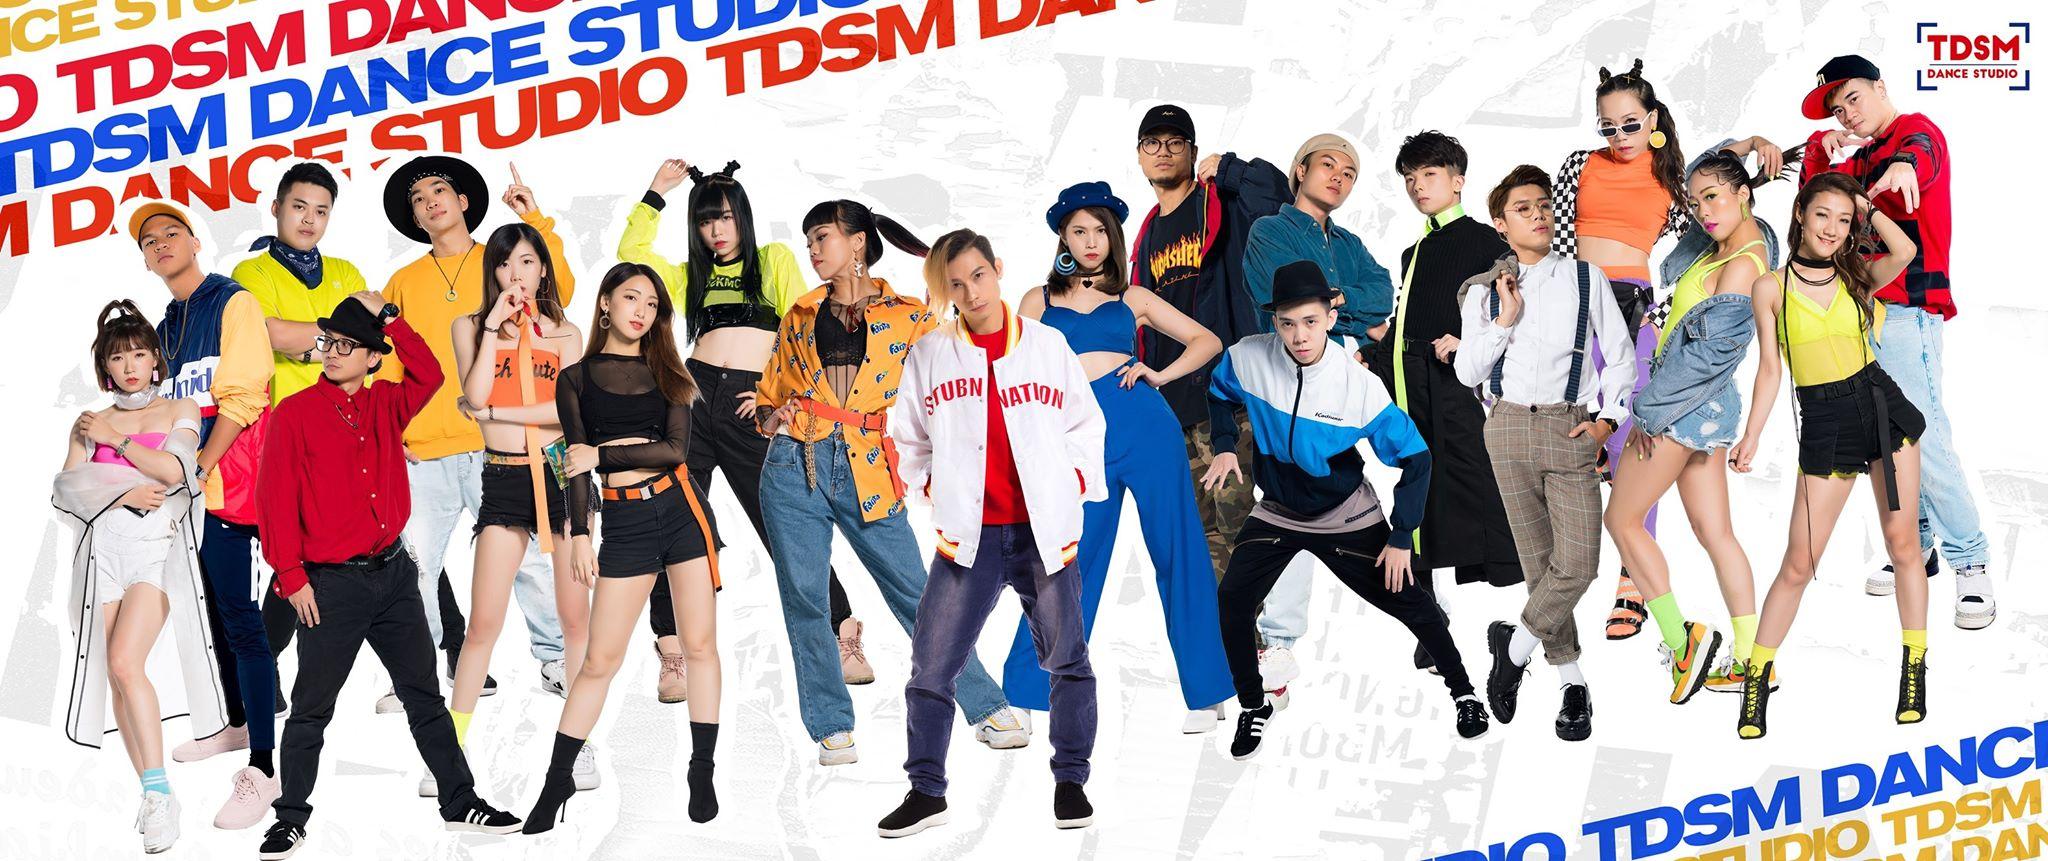 TDSM Dance Studio